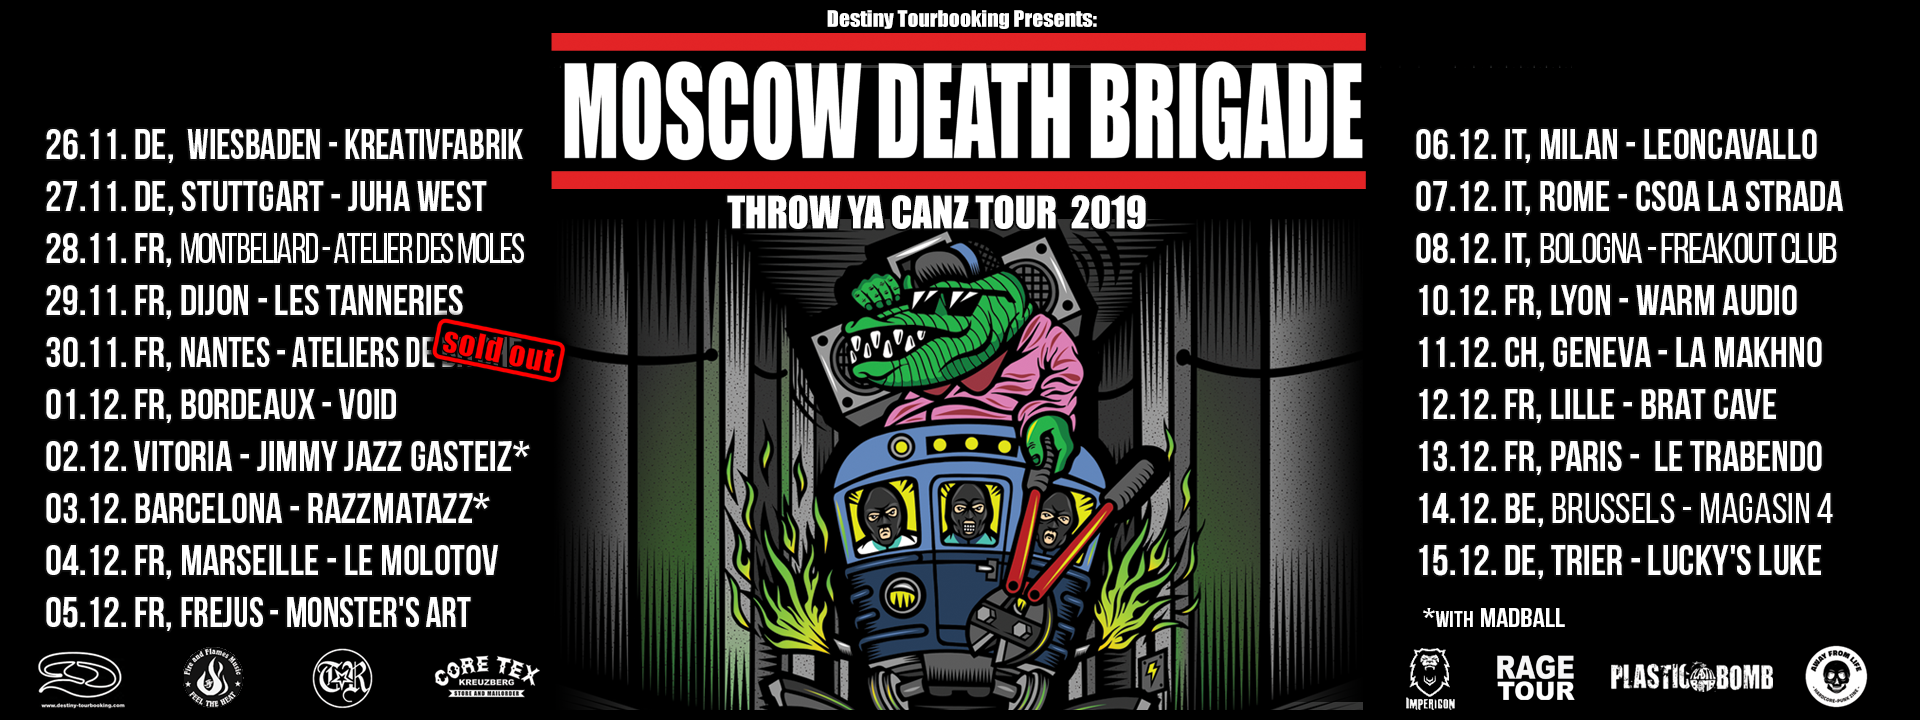 Moscow Death Brigade – Throw Ya Canz Tour 2019